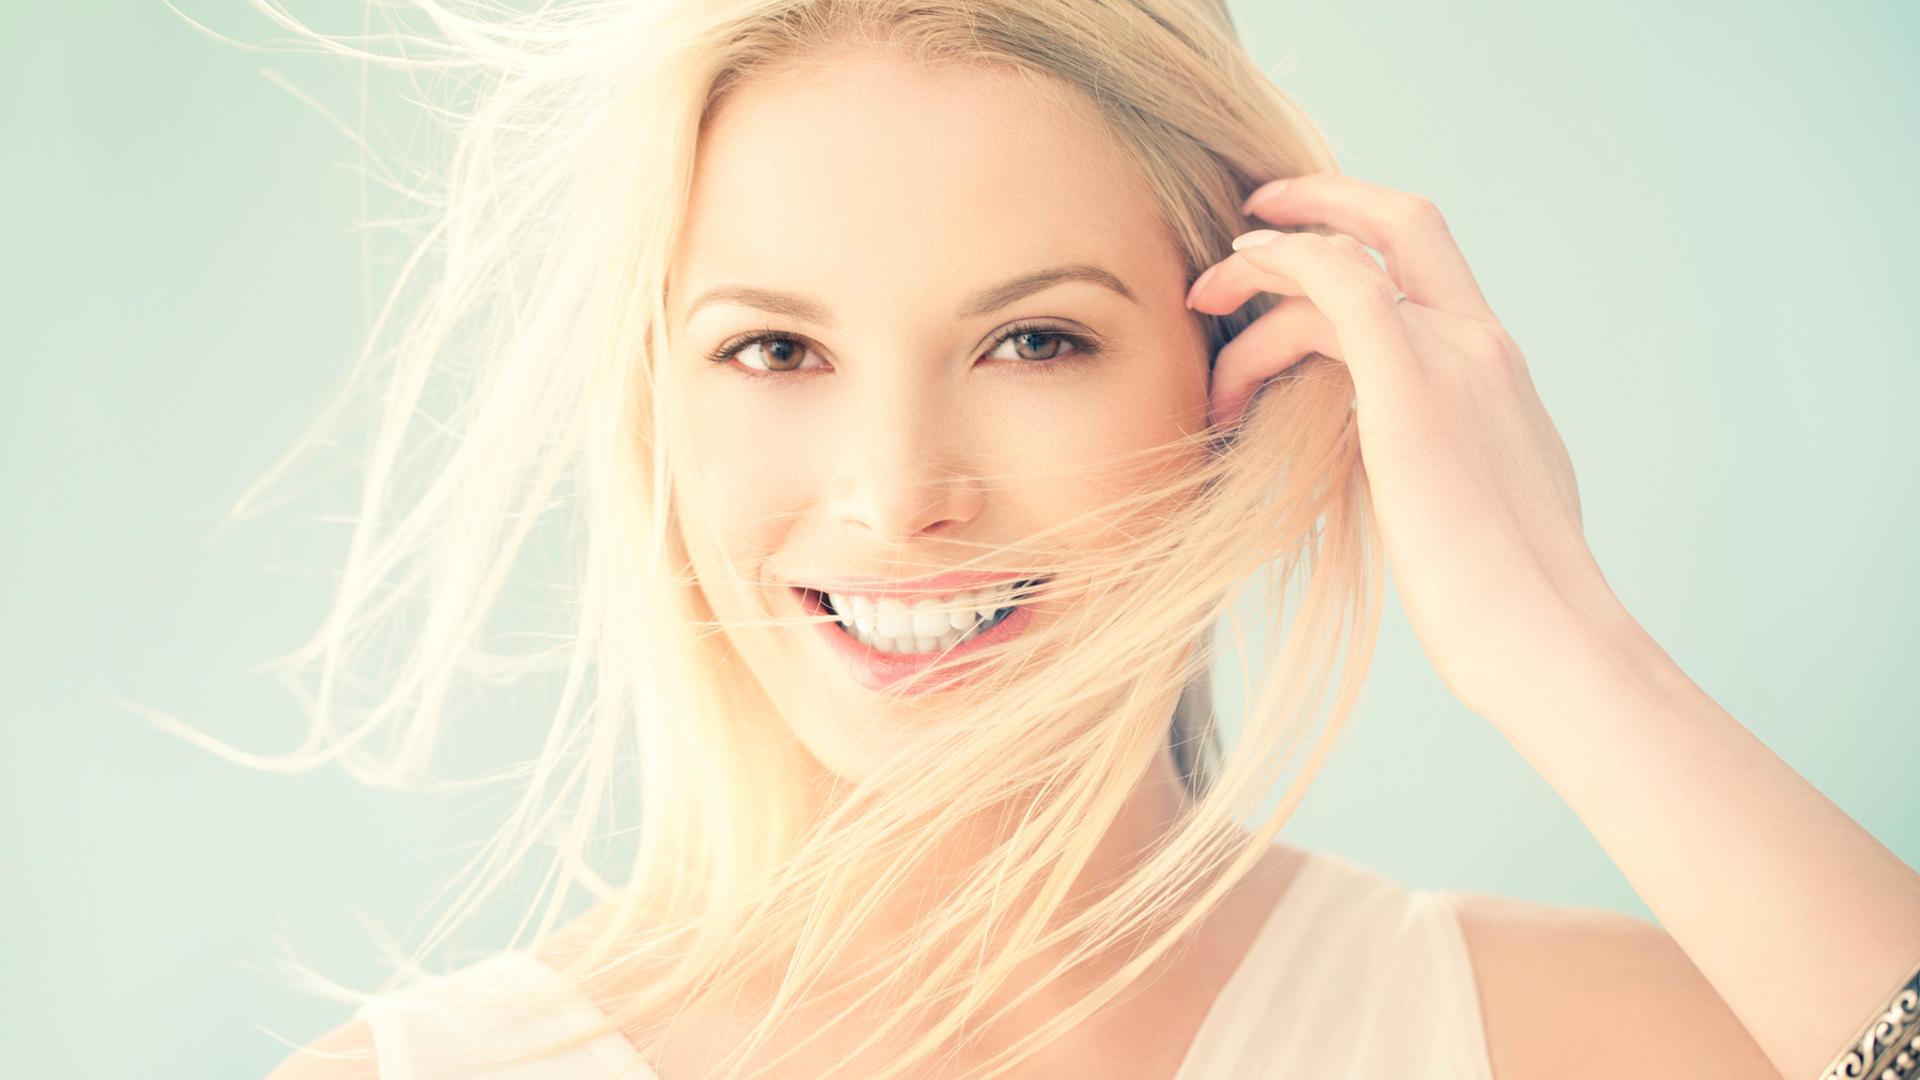 Beautiful woman smiling | Sheknows.com